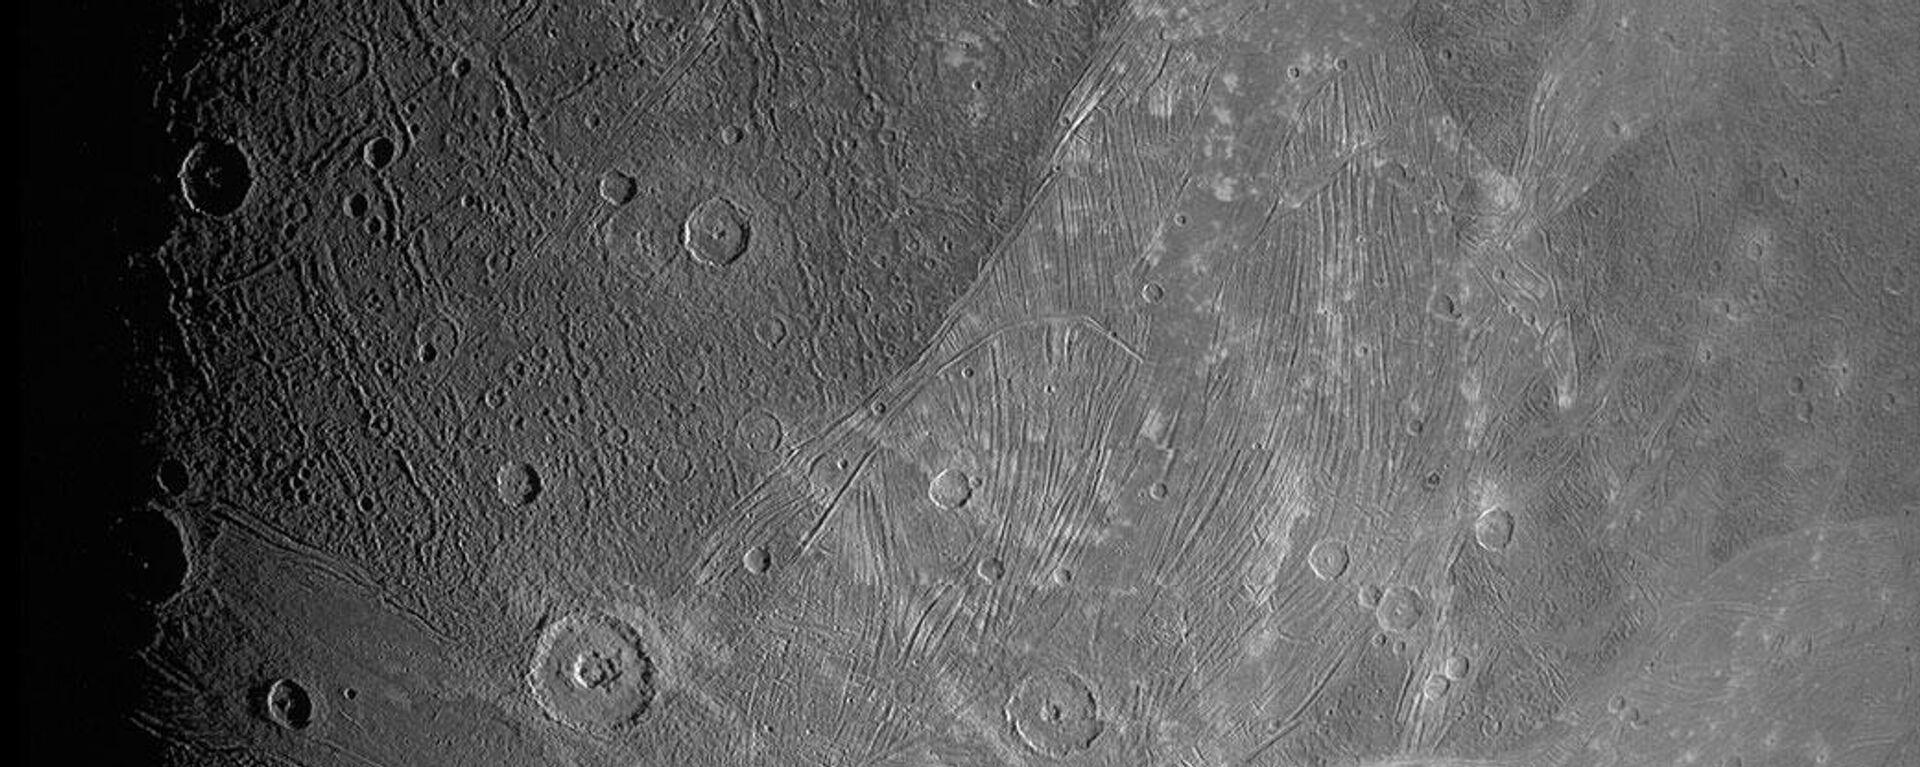 Ganímedes, la luna más grande de Júpiter - Sputnik Mundo, 1920, 08.06.2021